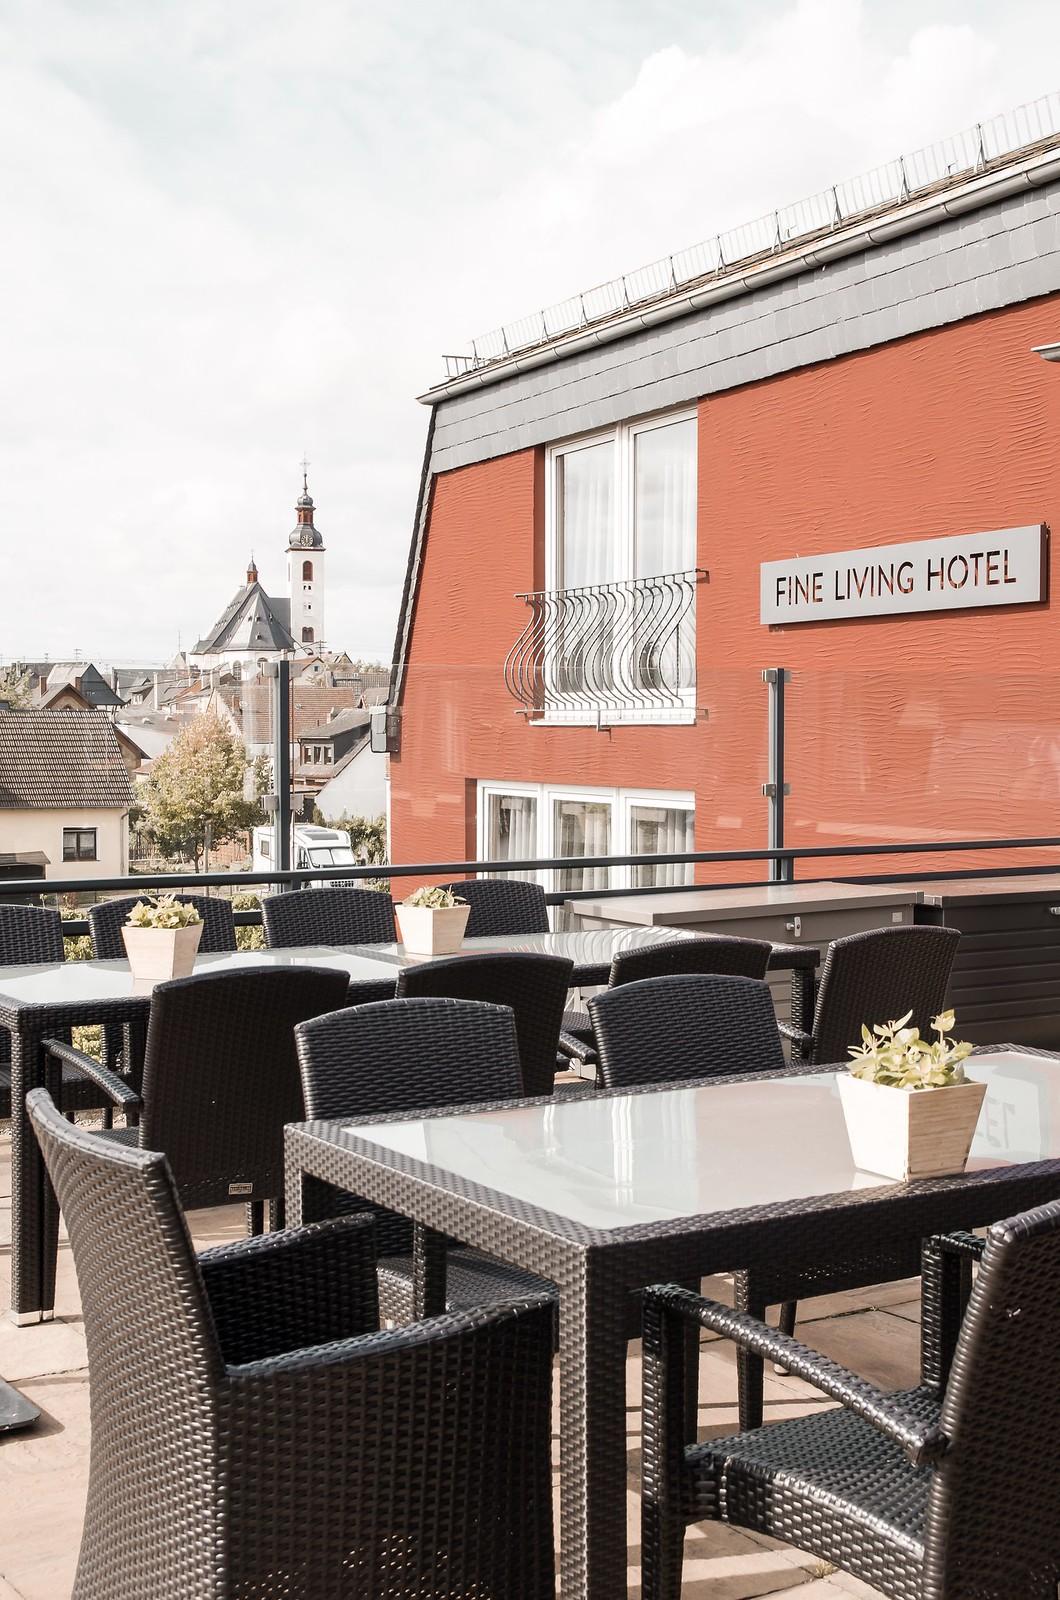 Nägler's Fine Lounge Hotel | ©mvesblog